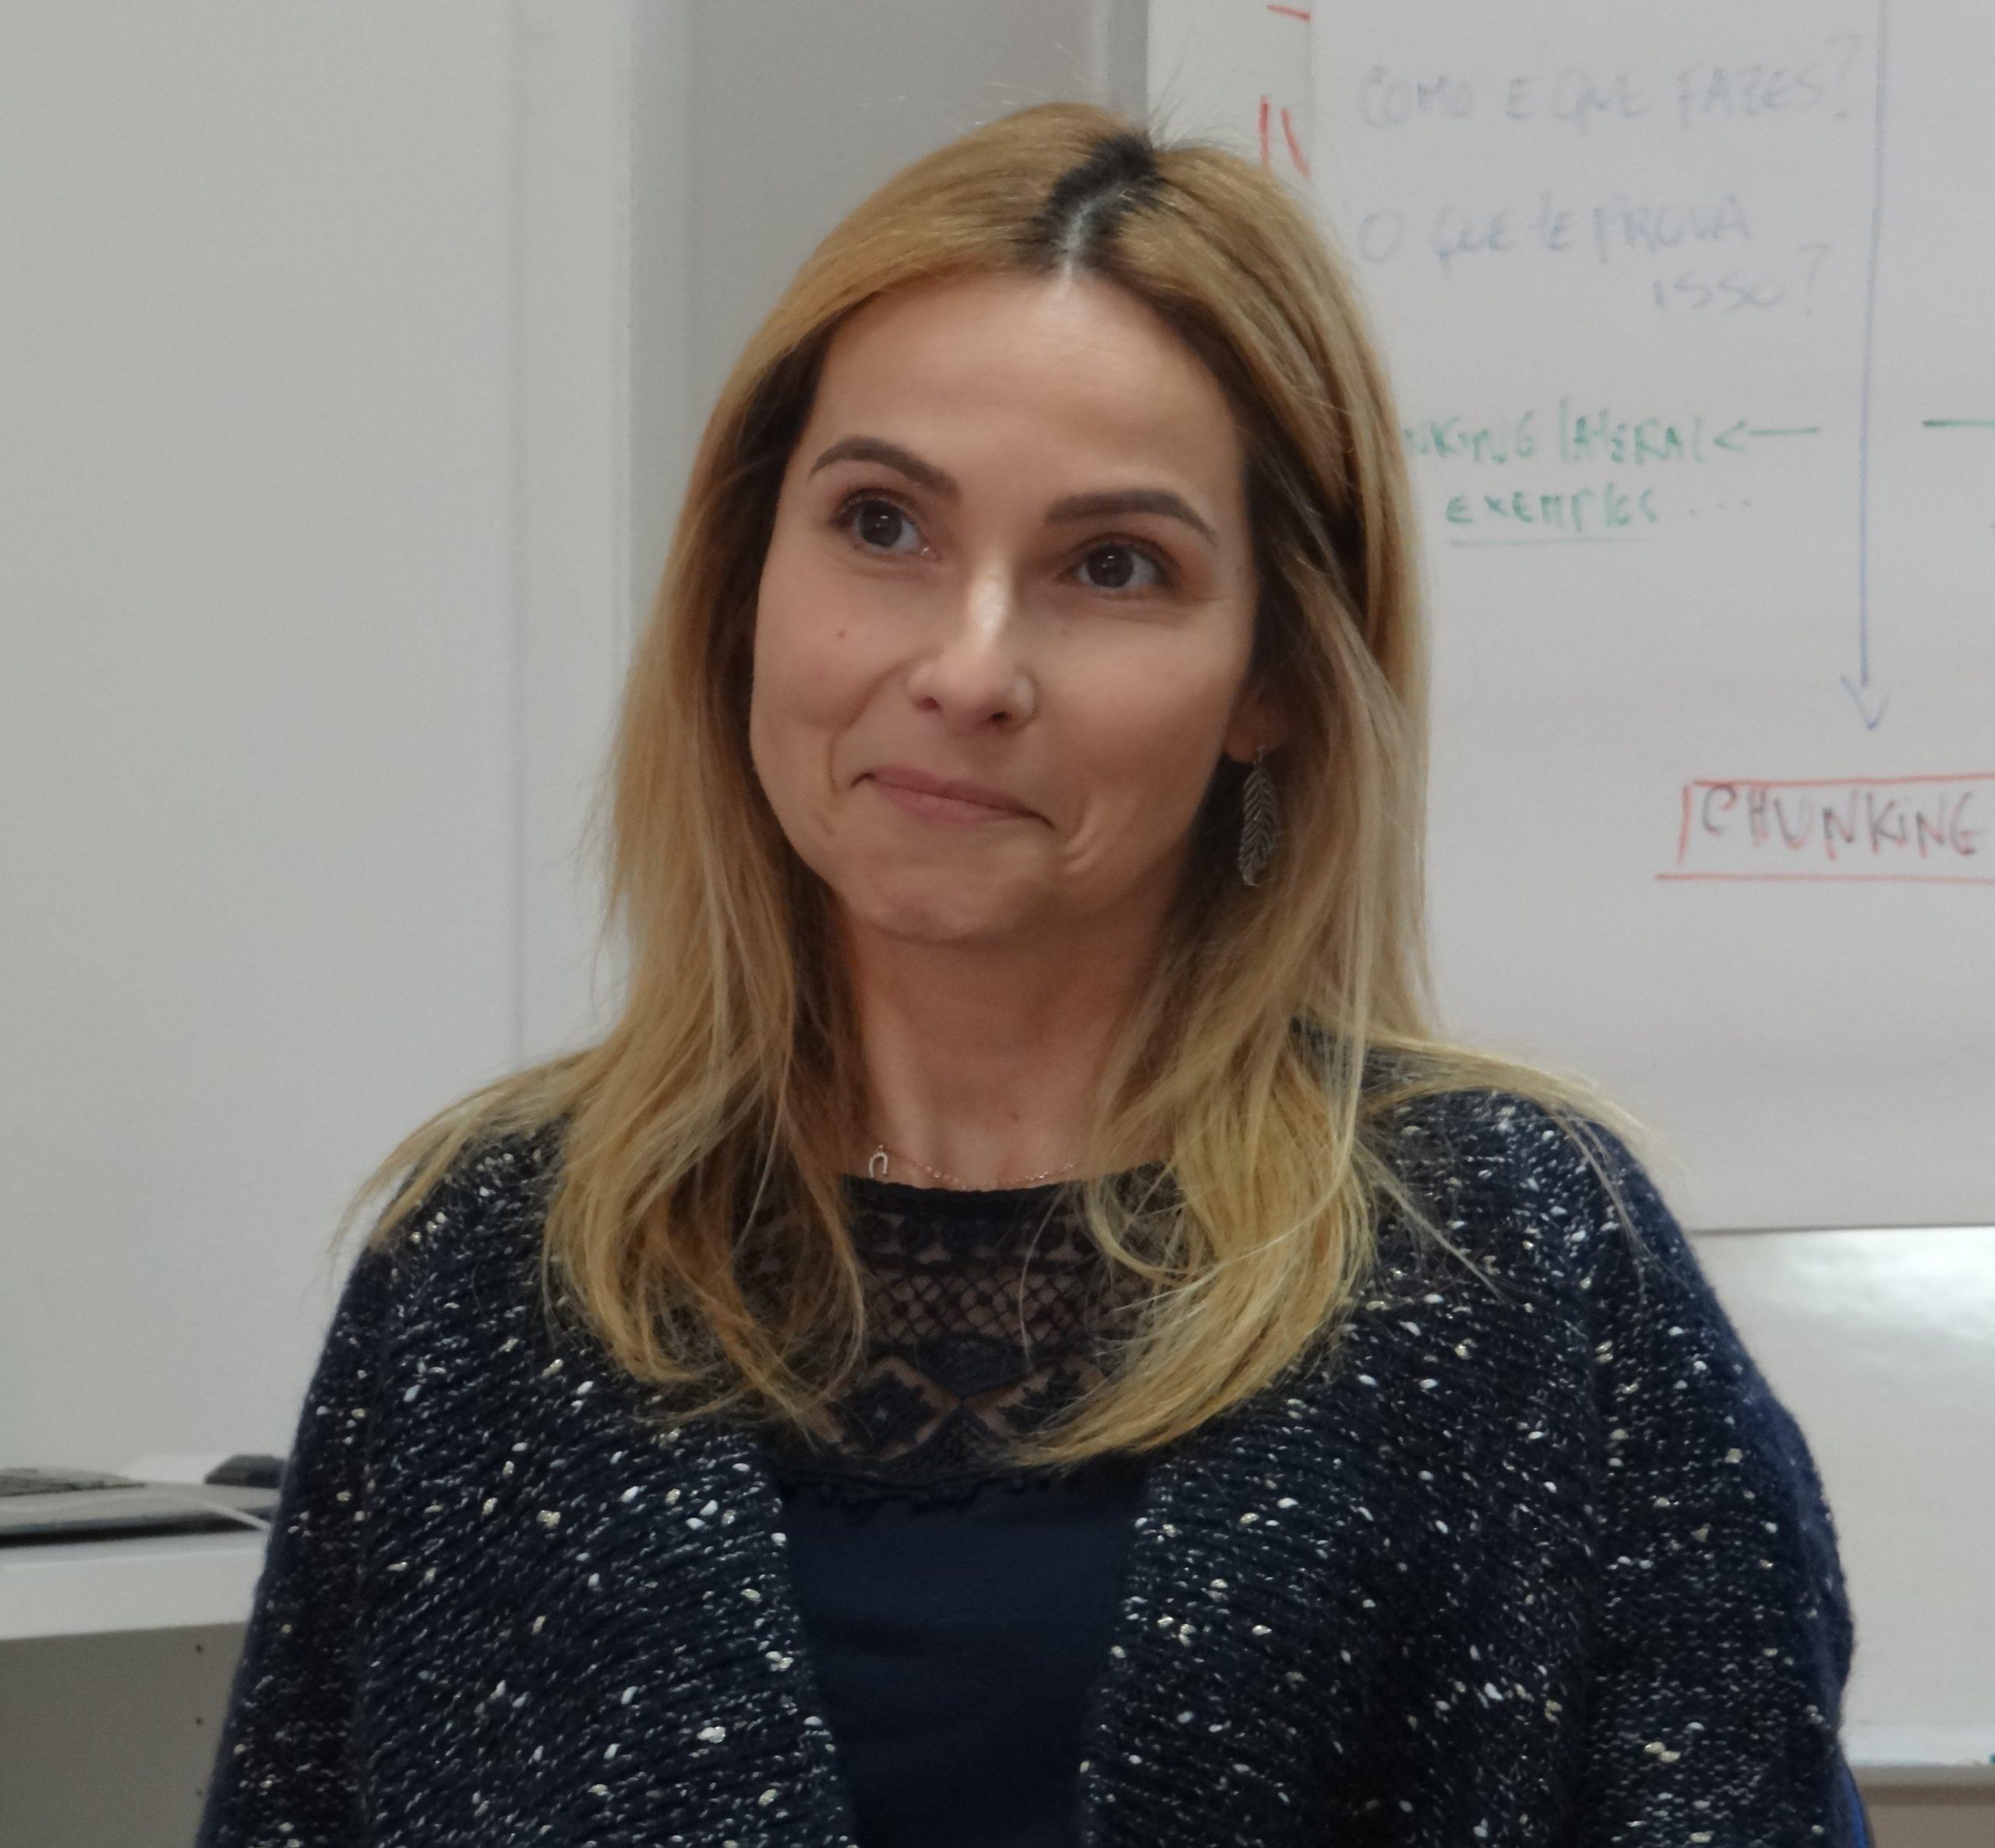 Raquel B. Neves